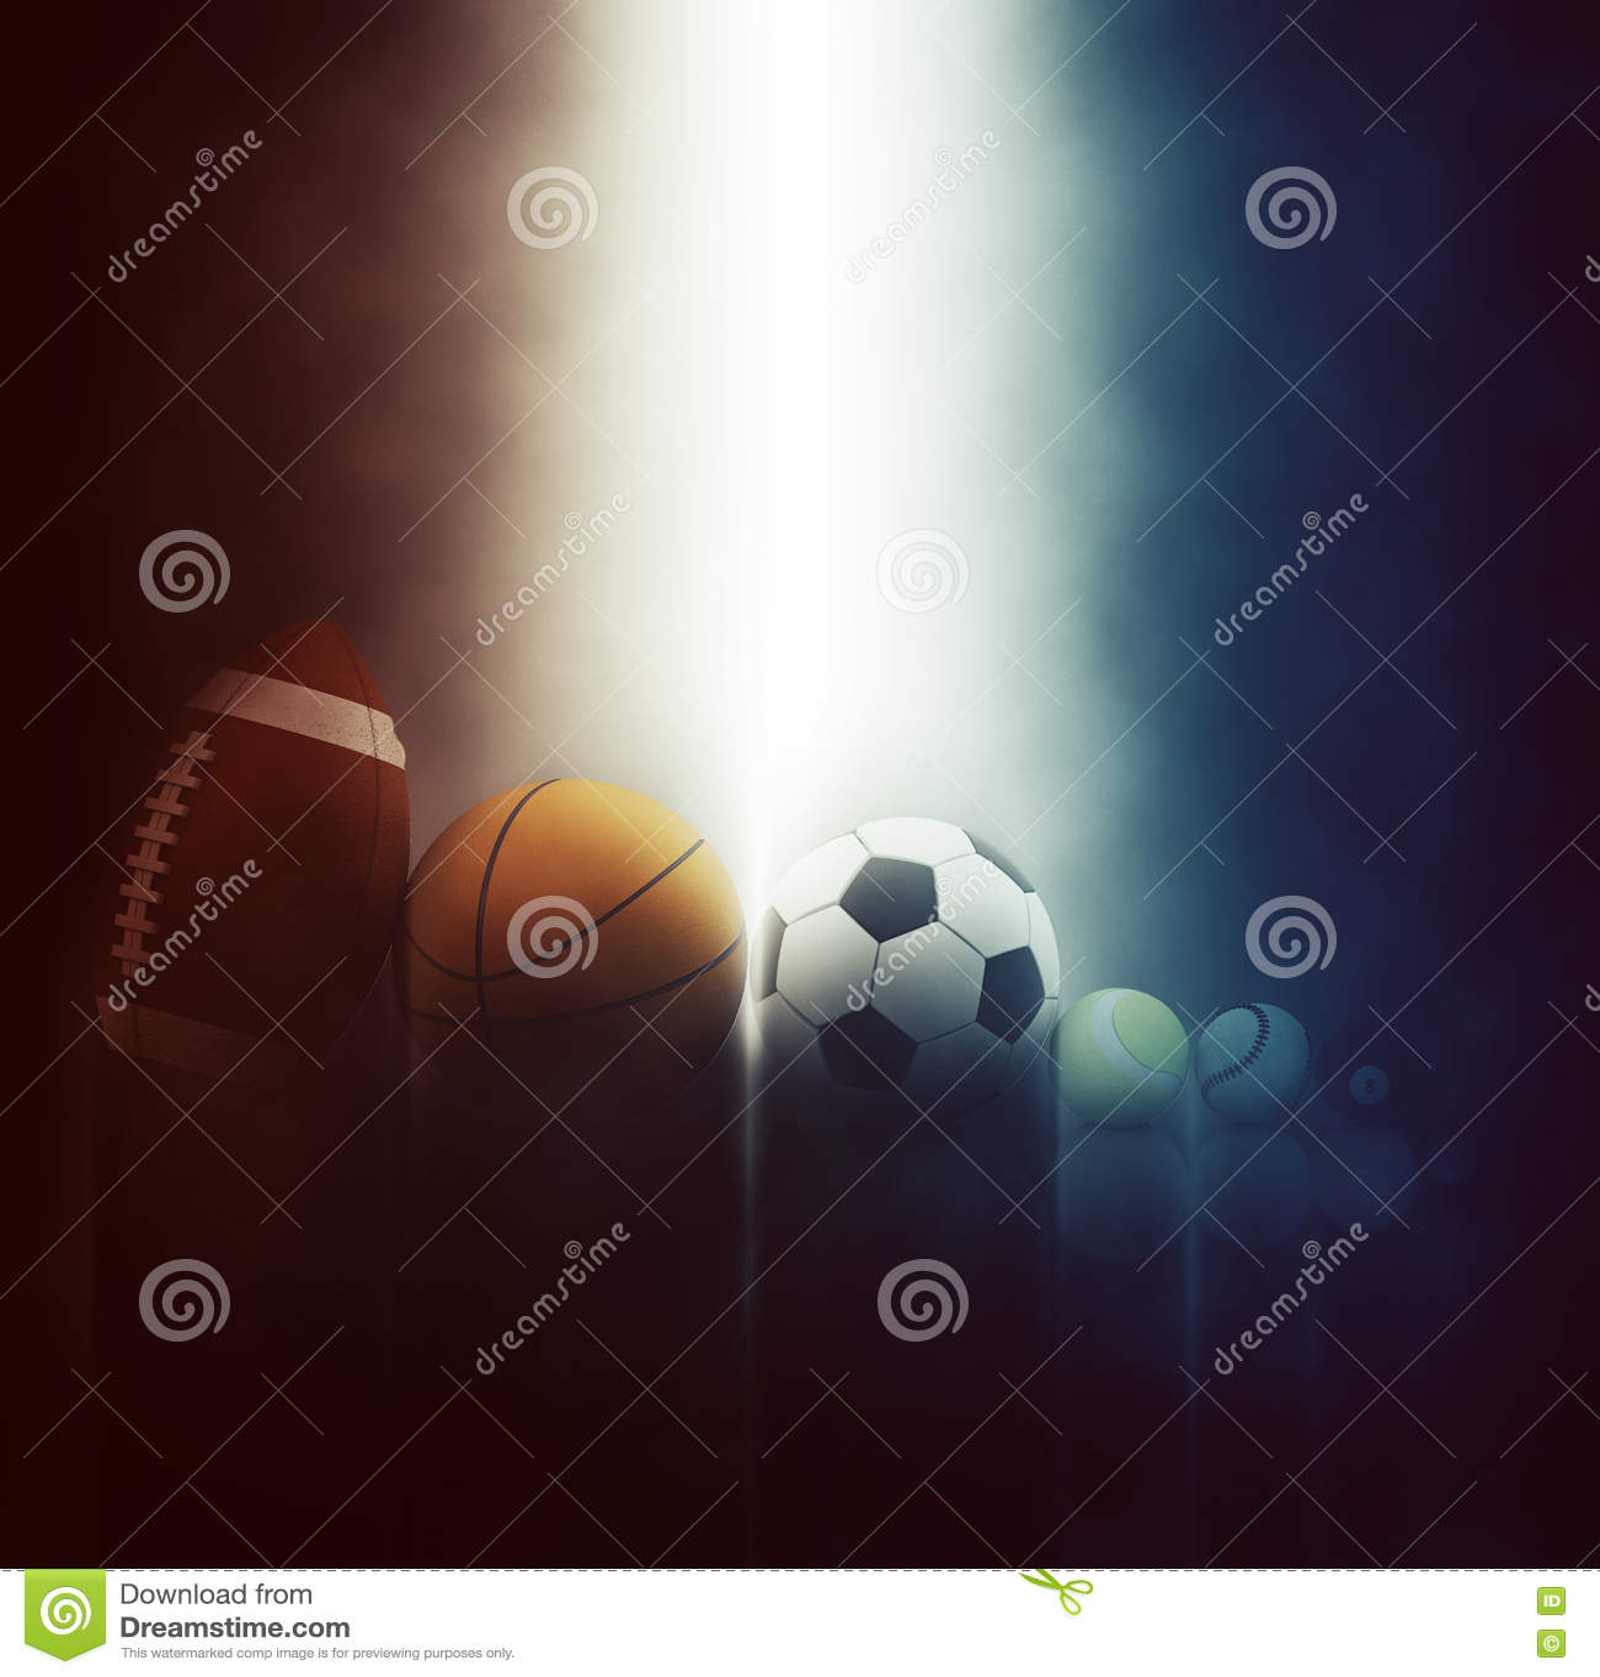 3D Sports Balls Backgrounds